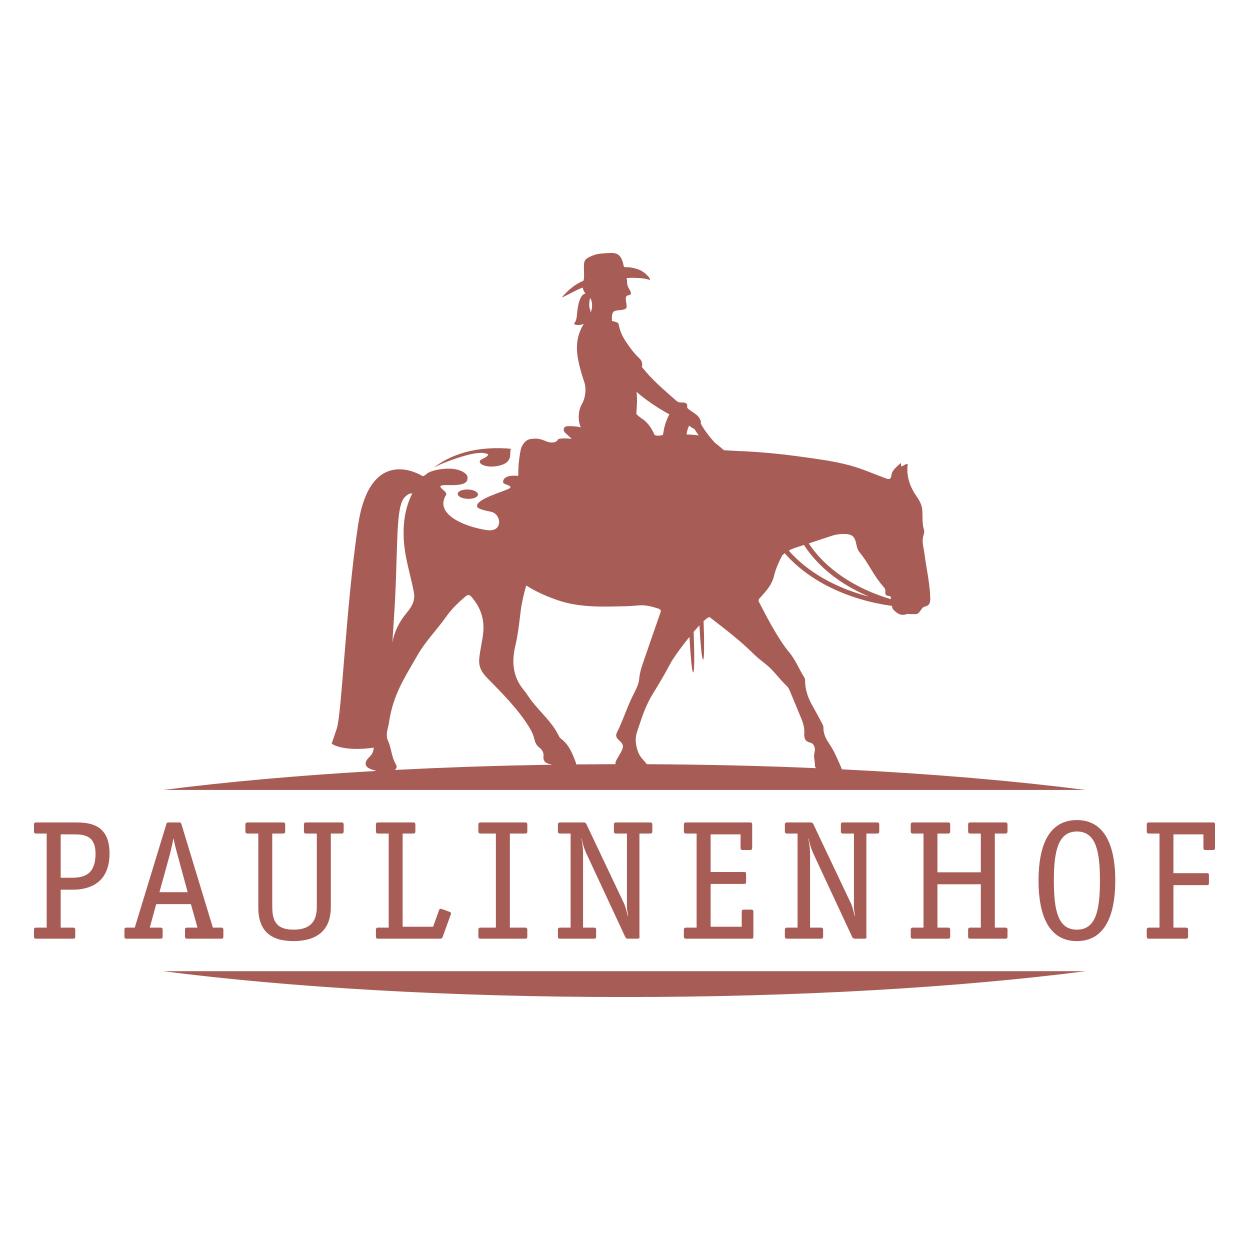 Paulinenhof Appaloosa-Zucht Gudrun Schönhofer-Hofmann